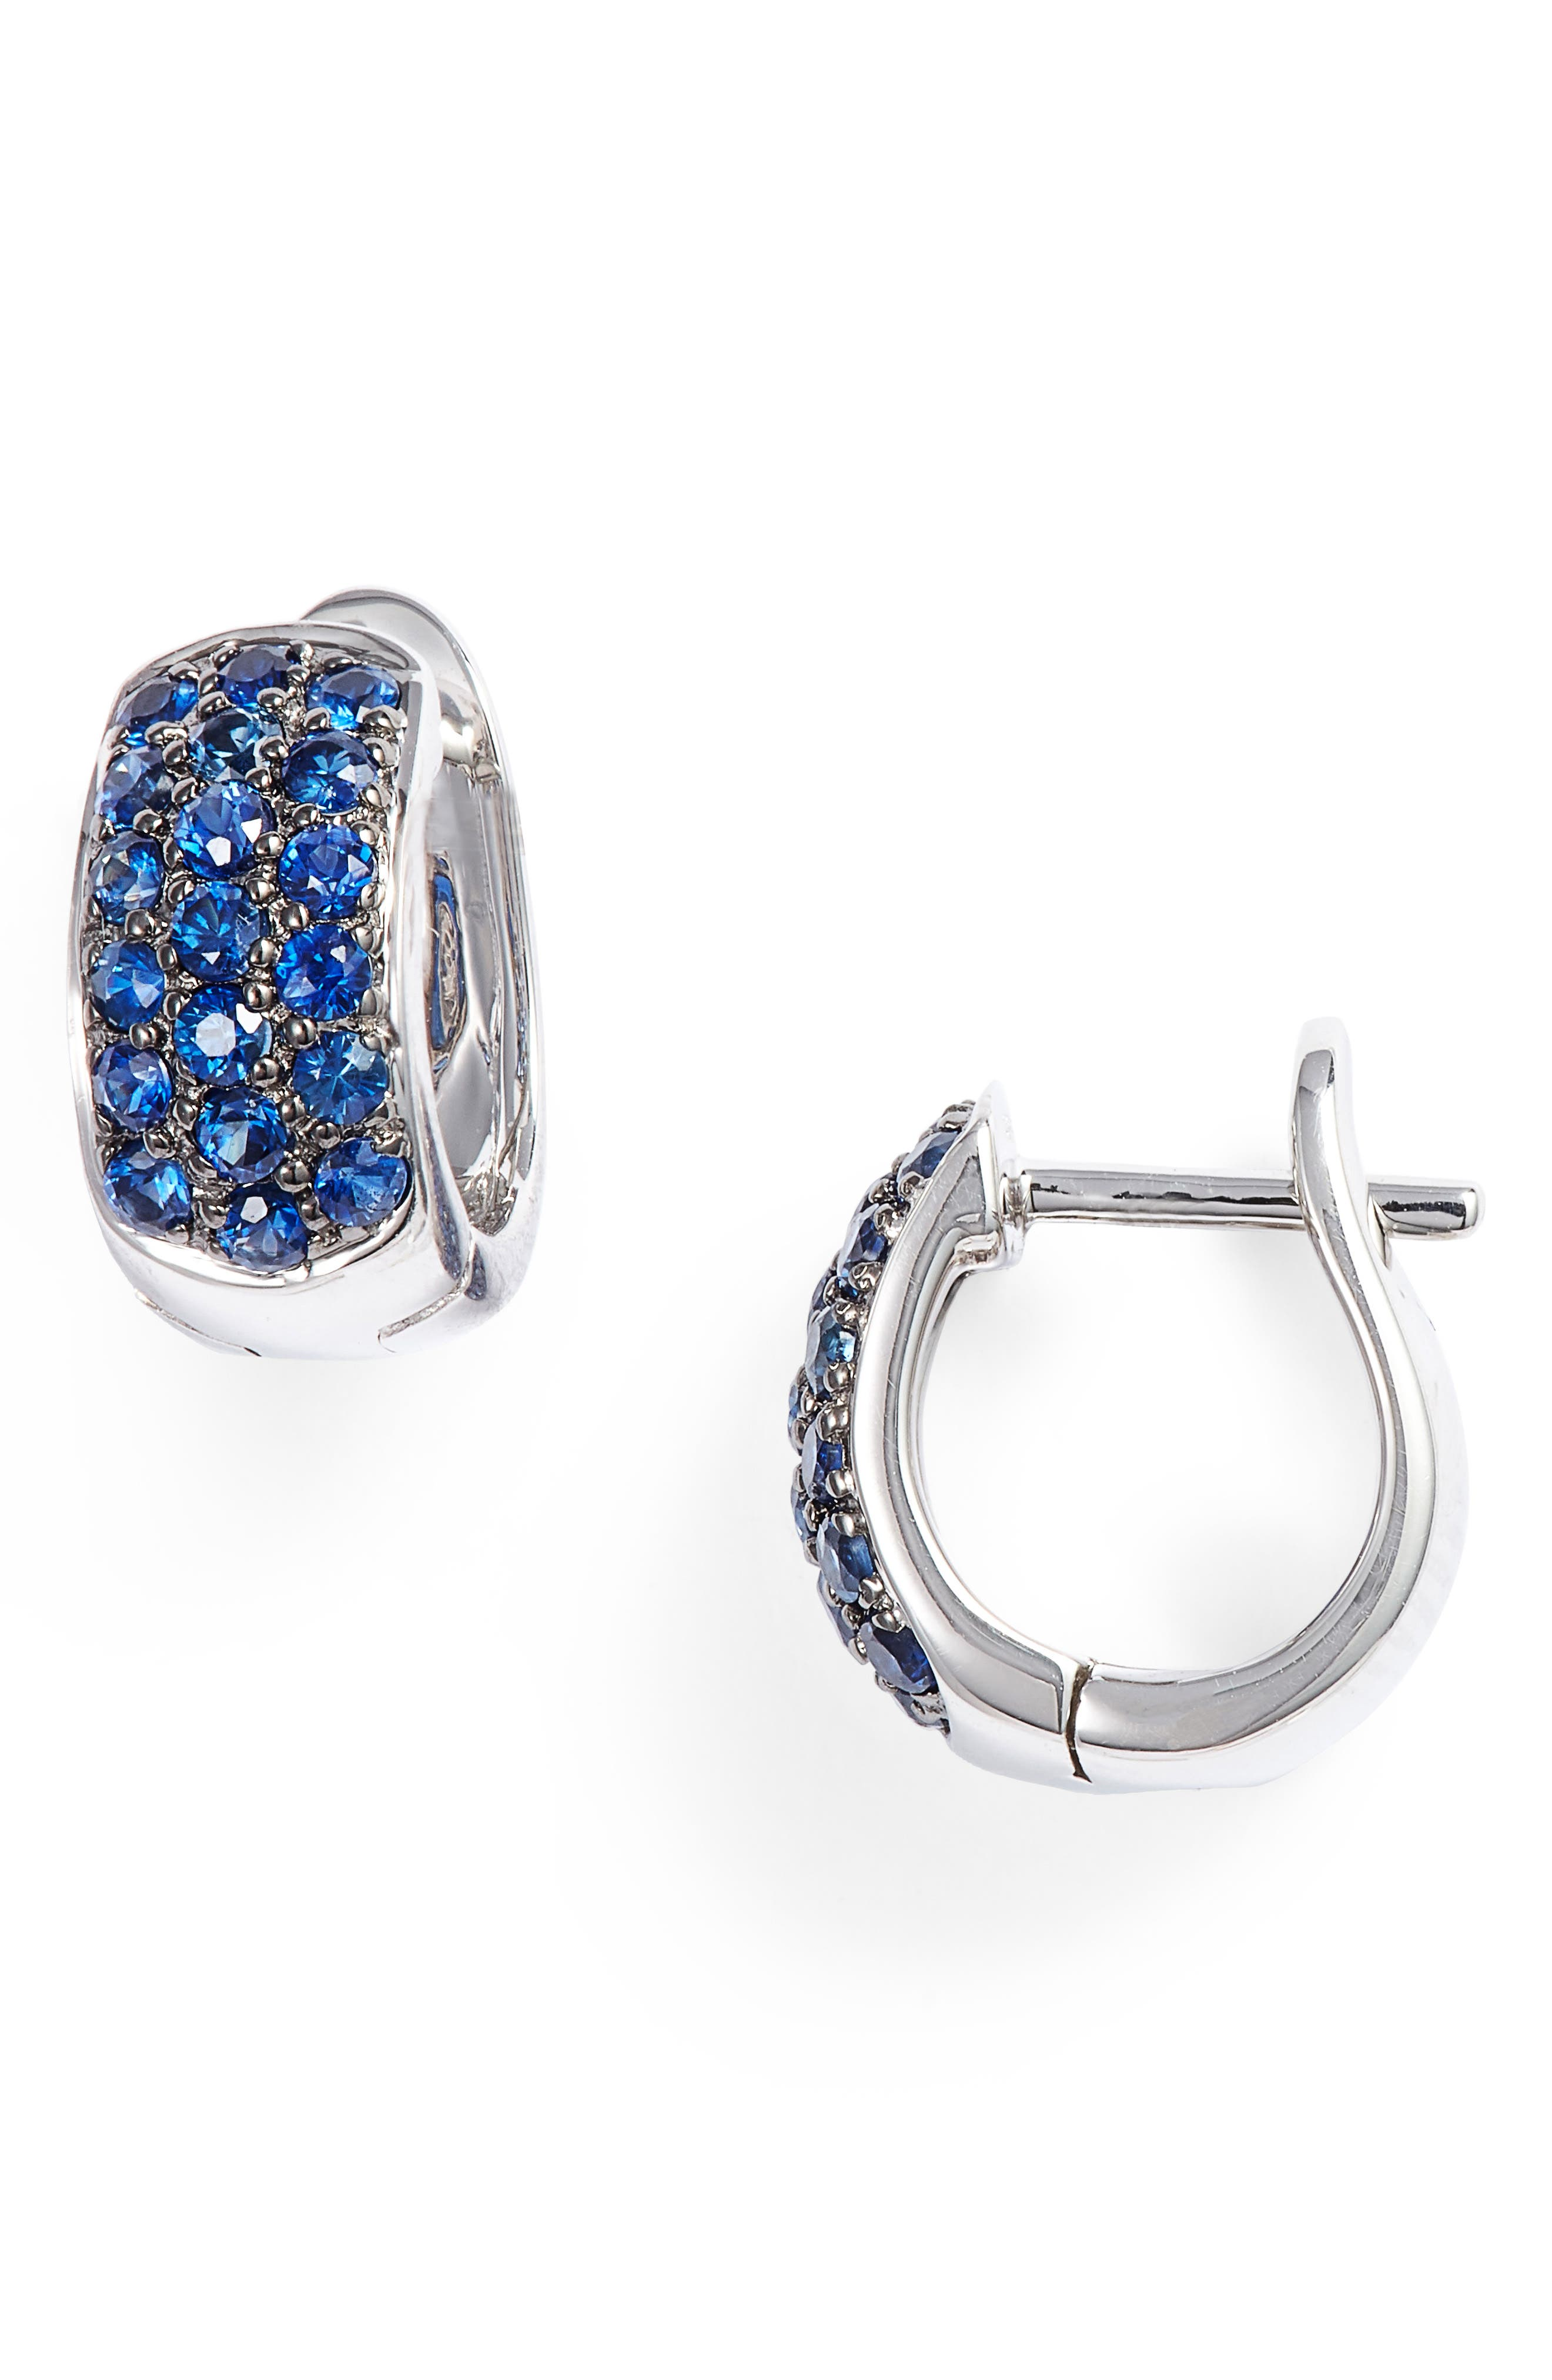 Wide Gem Huggie Earrings,                         Main,                         color, YELLOW GOLD/ BLUE SAPPHIRE